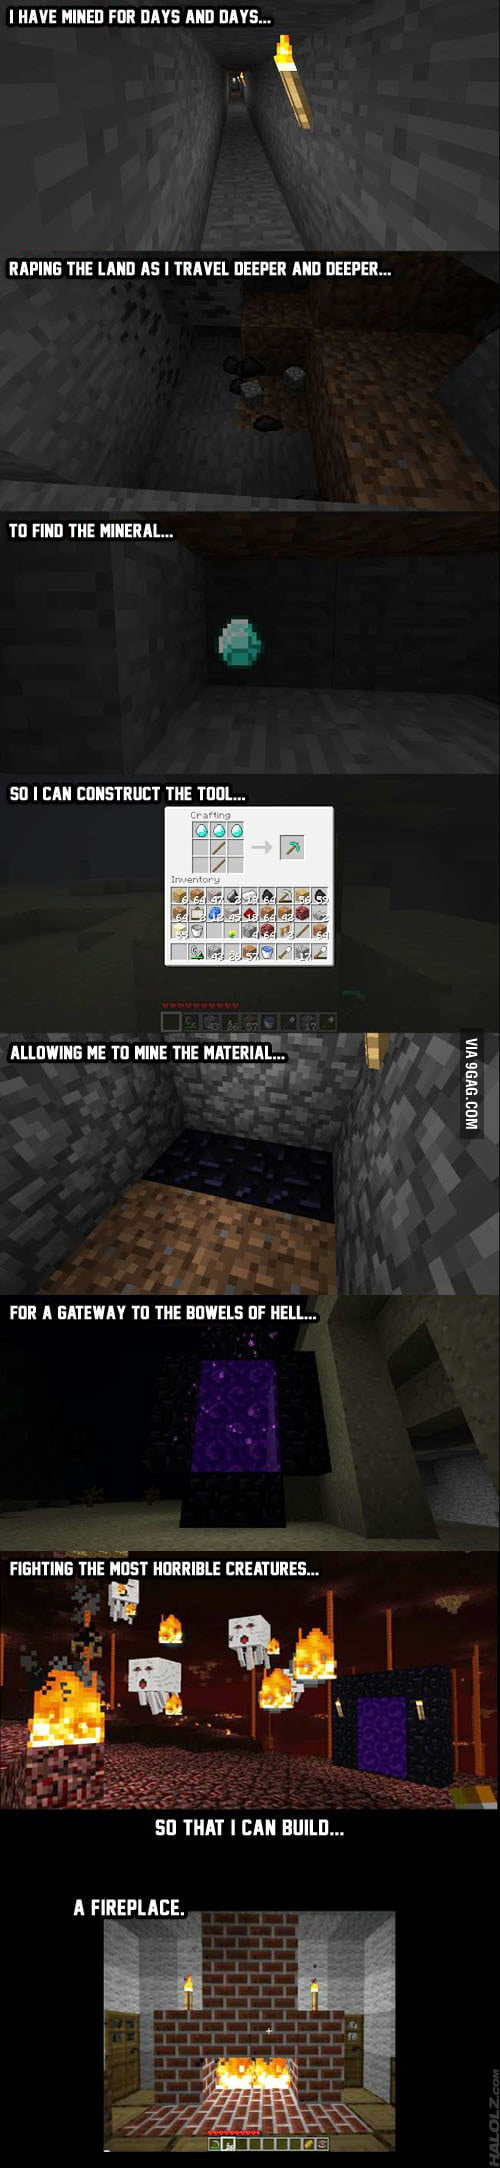 My minecraft journey